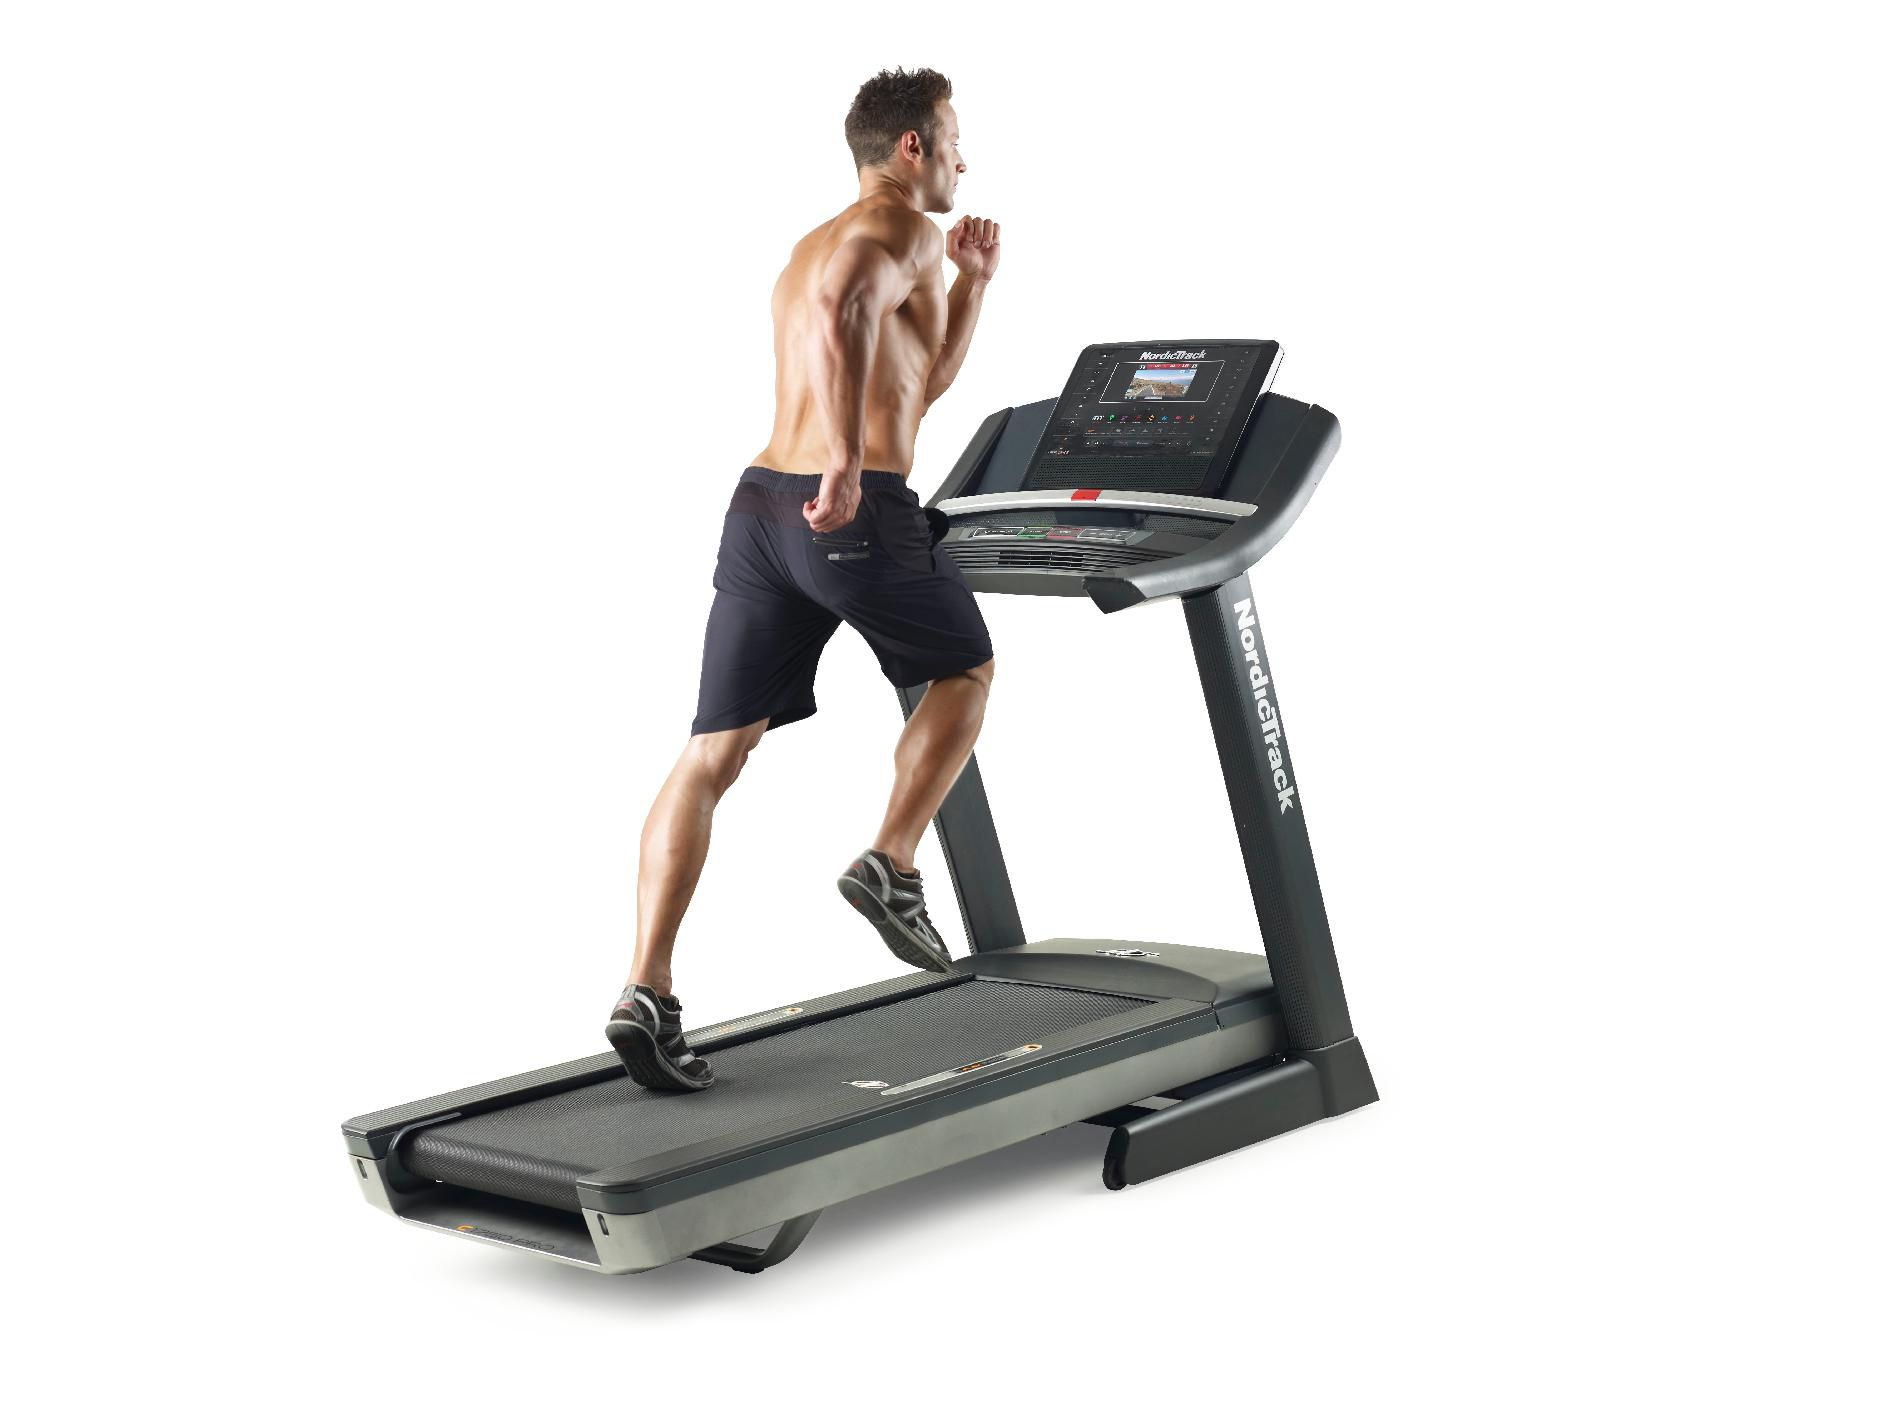 NordicTrack C1750 Pro Treadmill